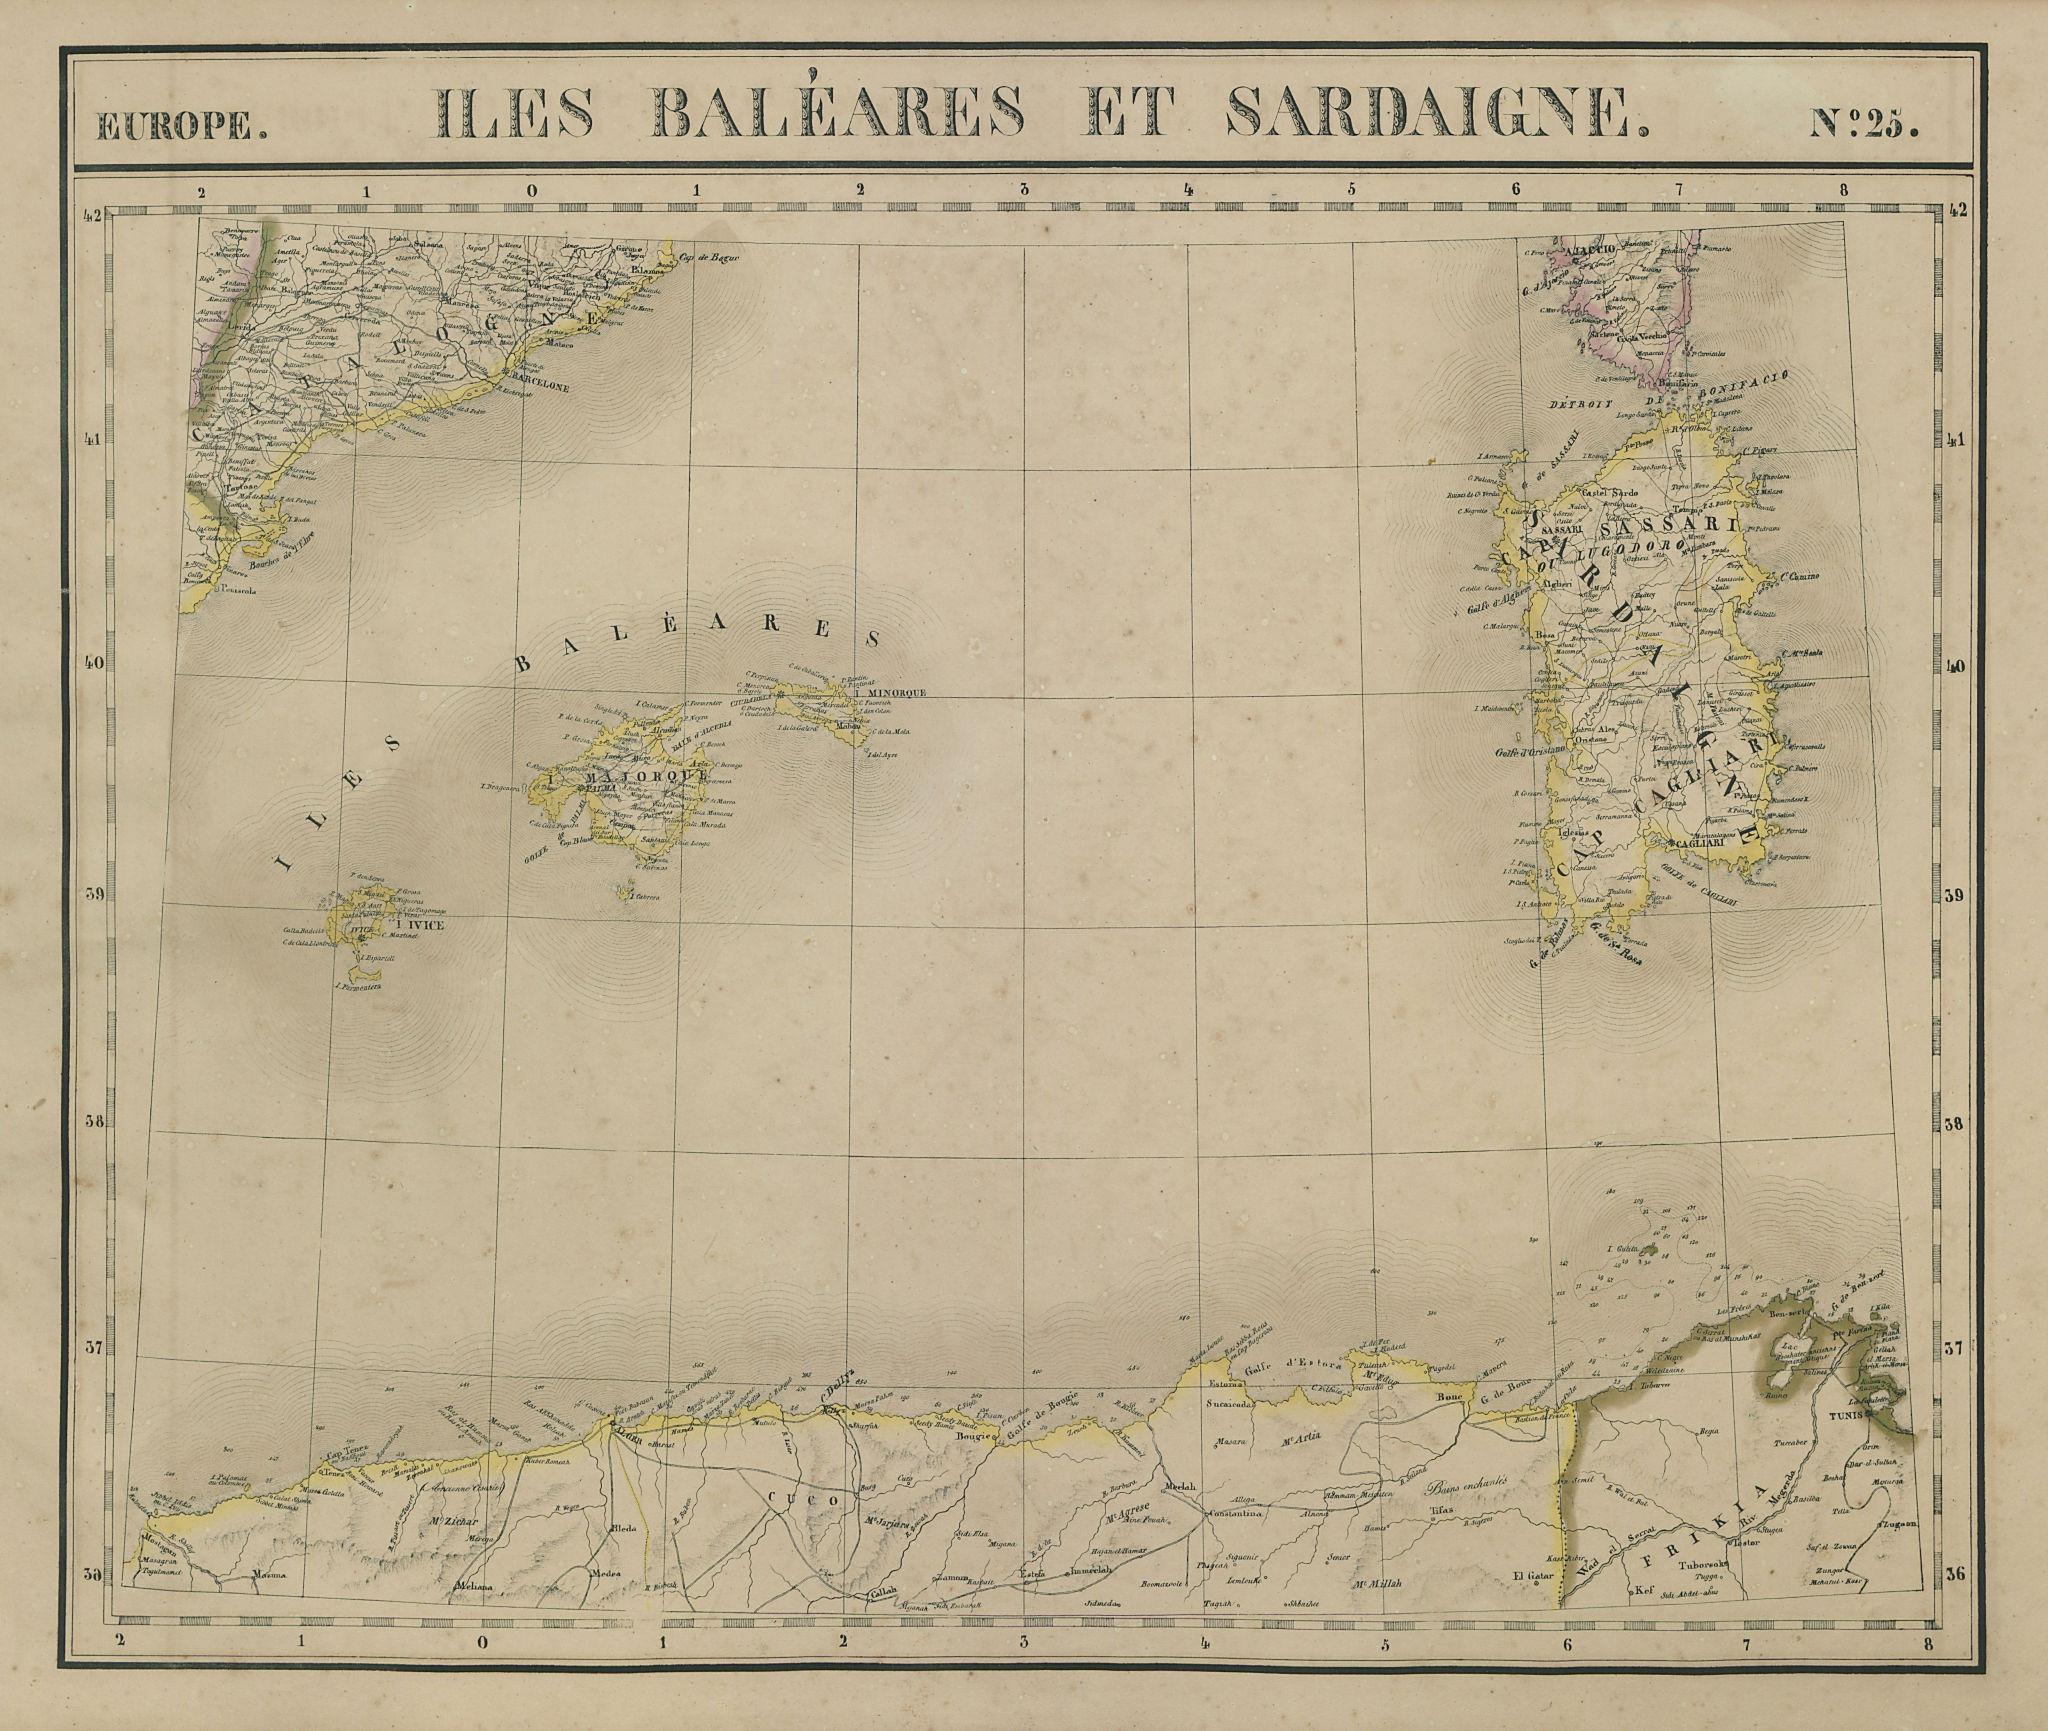 Europe. Iles Baléares & Sardaigne #25 Sardinia Balearics VANDERMAELEN 1827 map